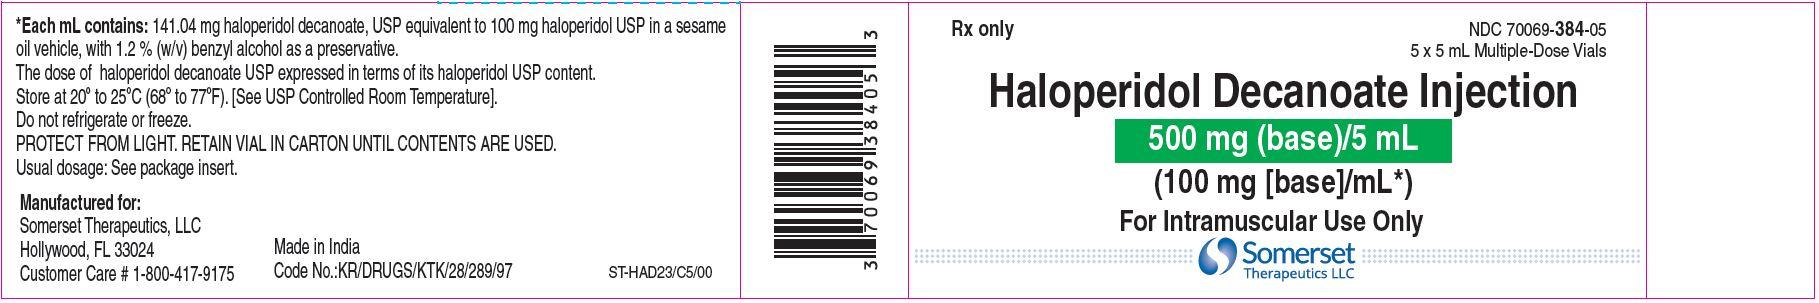 carton label 5s